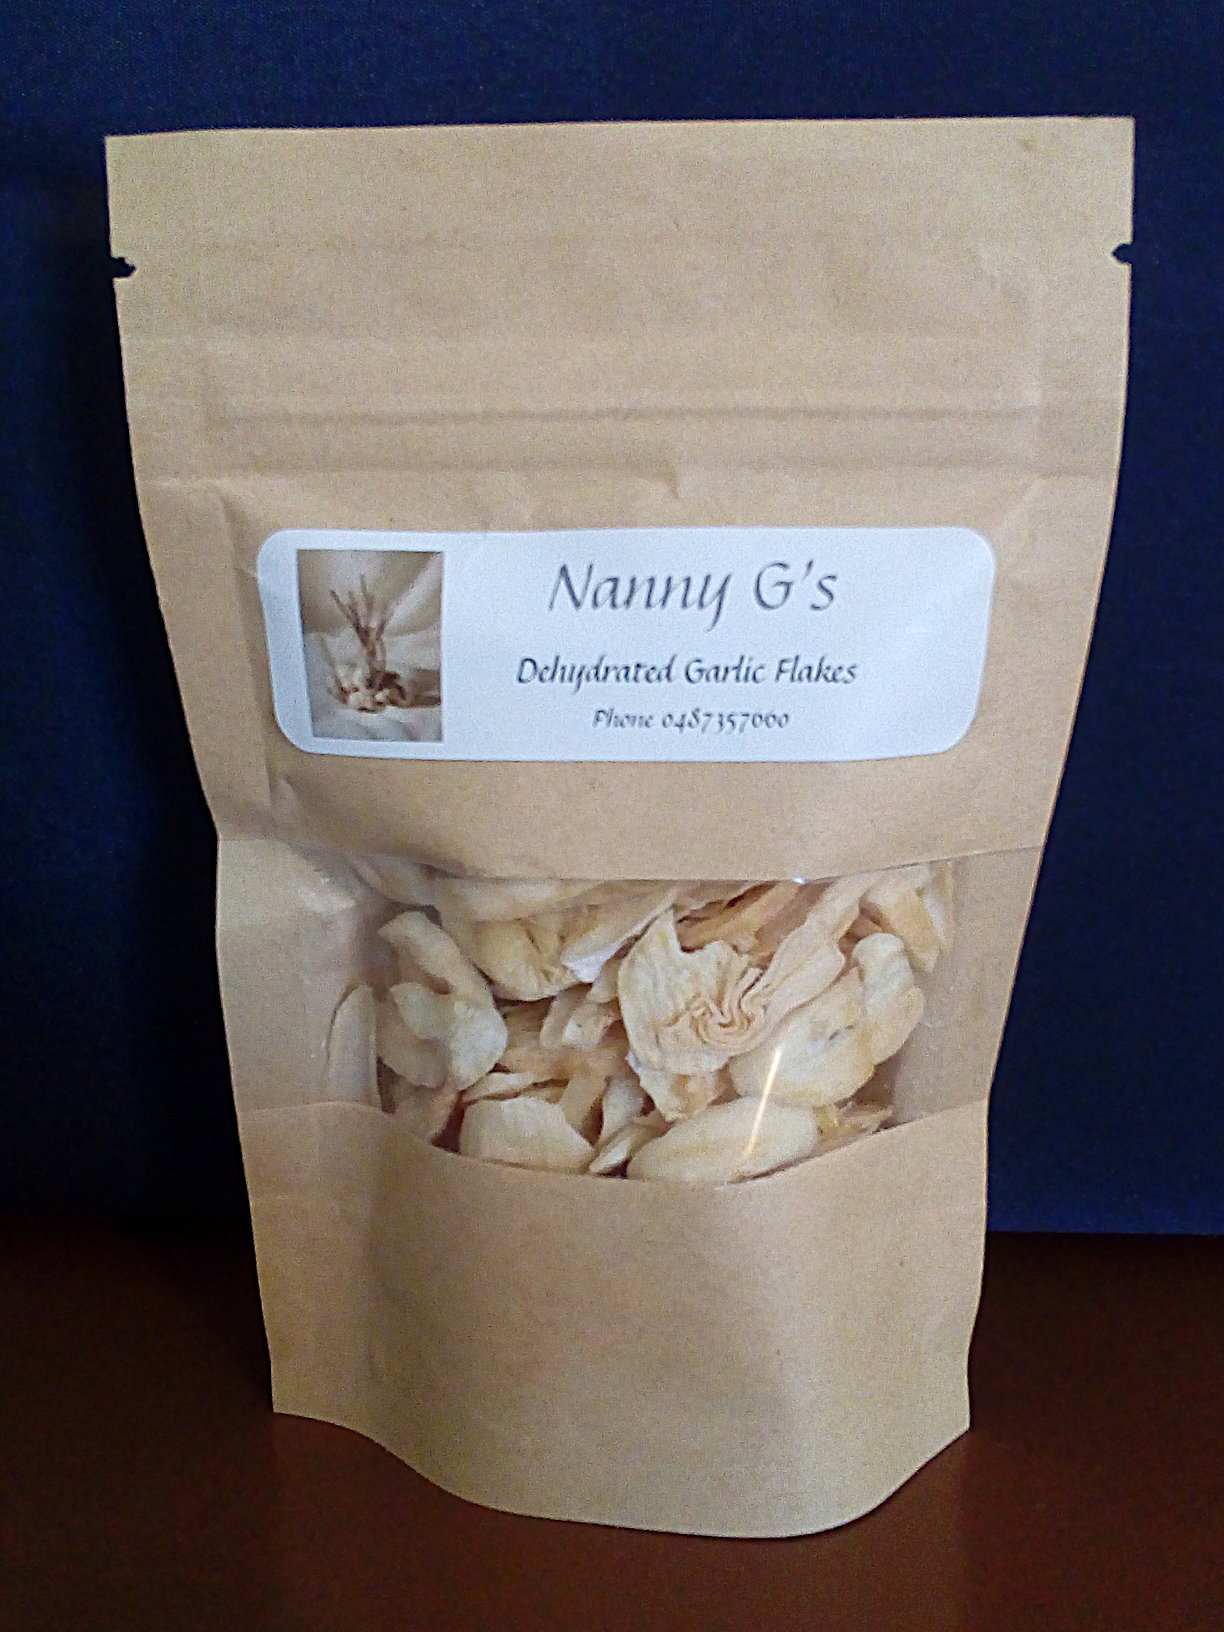 rsz_dehydrated_garlic_nannygs - Market